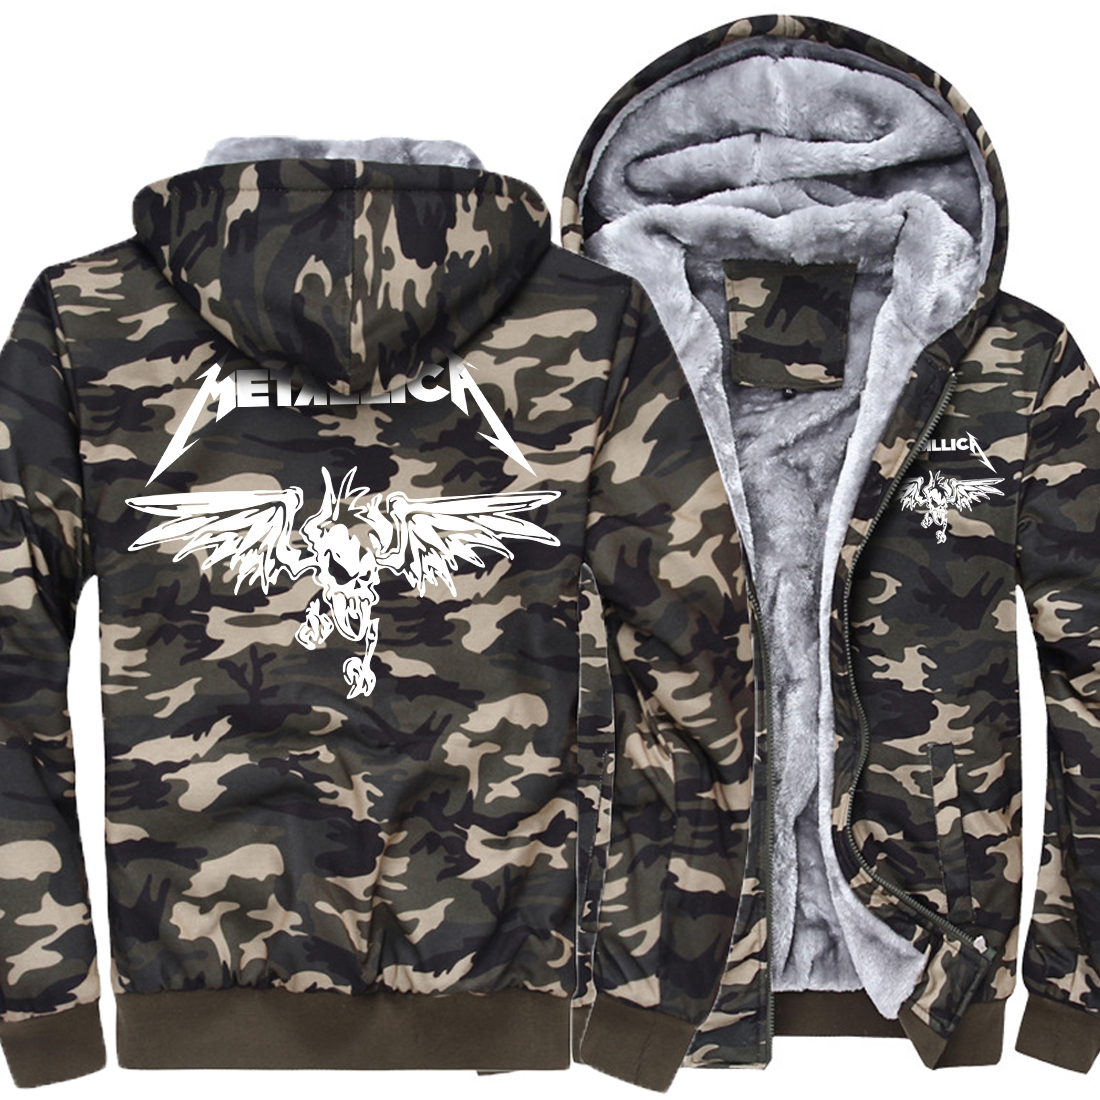 Winter Jacket Men 2019 New Fashion Thick Hoodies Mens Camouflage Raglan Sweatshirts Brand Men's Hip Hop Sportswear Hoodie Kawaii